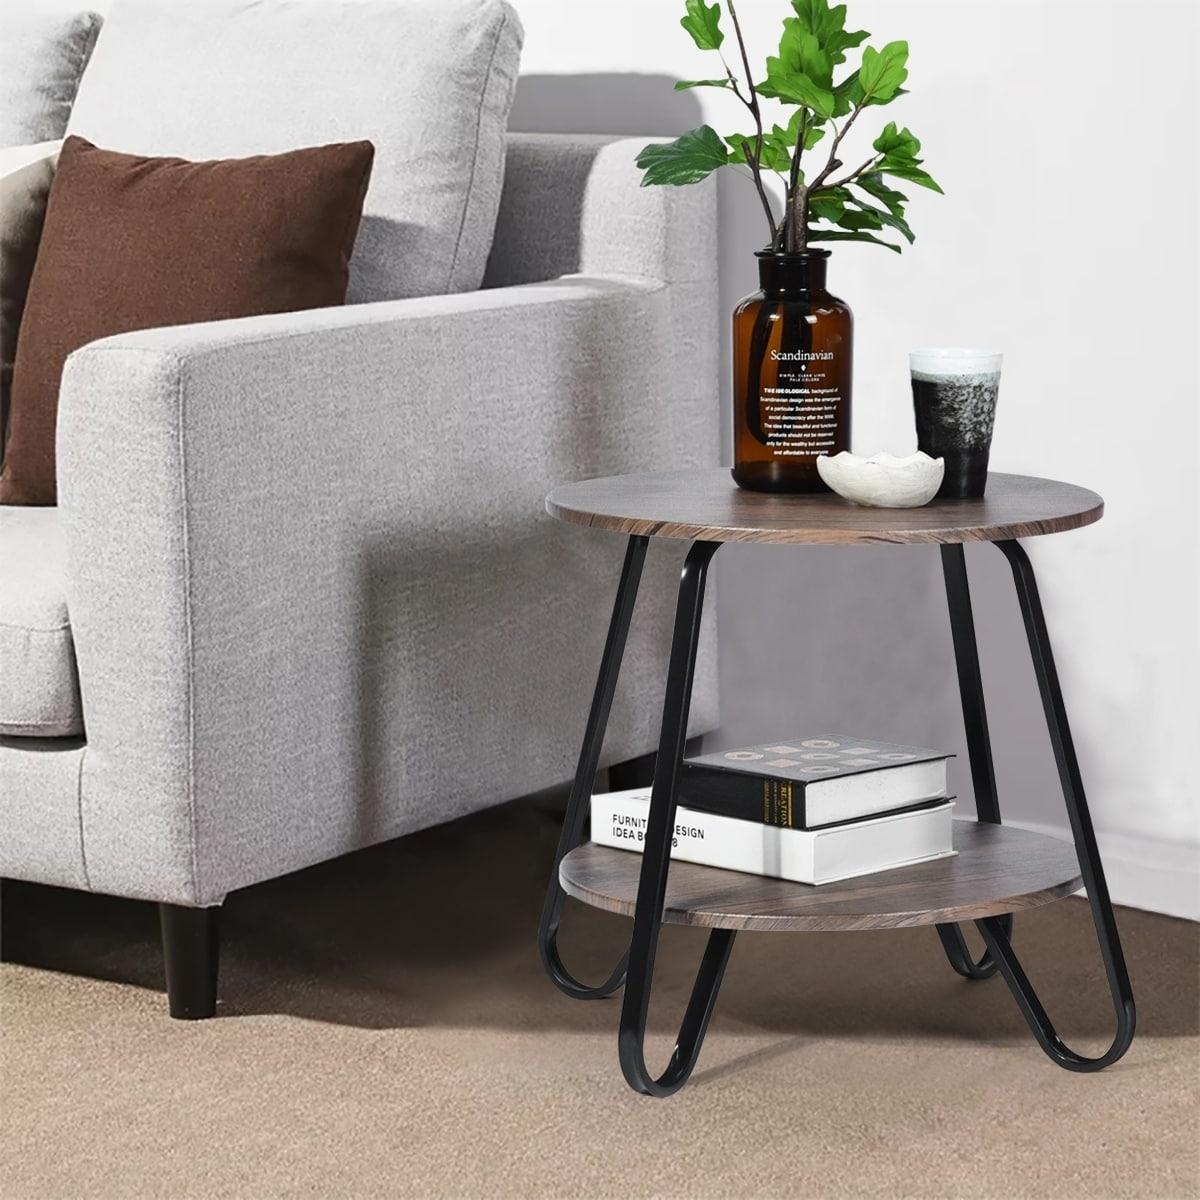 - Shop Furniture R Round 2-shelf Coffee Table Dark Brown End Side